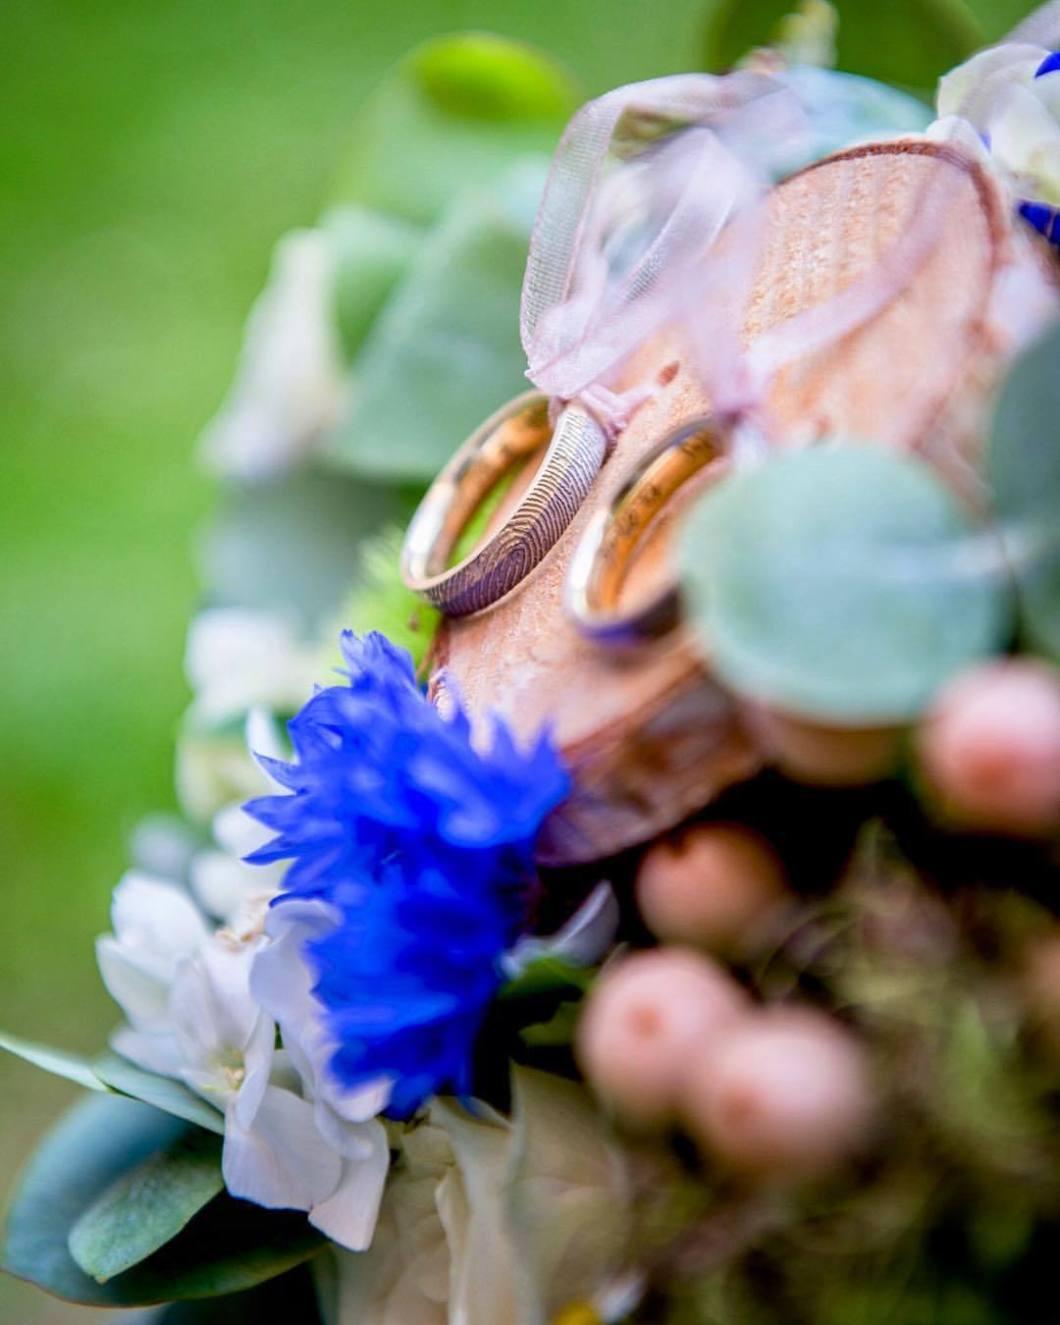 Wedding rings, Kerkrade/NL 2018..wonderful selfmade wedding rings with personal finger prints. What a wonderful idea!.#photooftheday #onephotoaday #photography #colorphotography #nikon #wedding #weddingphotography #brautpaar #bride #hochzeitsdeko #hochzeitsdeko #bridelife #photographerslife #weddingrings #weddingring #eheringe #hands #bride #groom #ehe #fingerprints (hier: Abdij Rolduc)